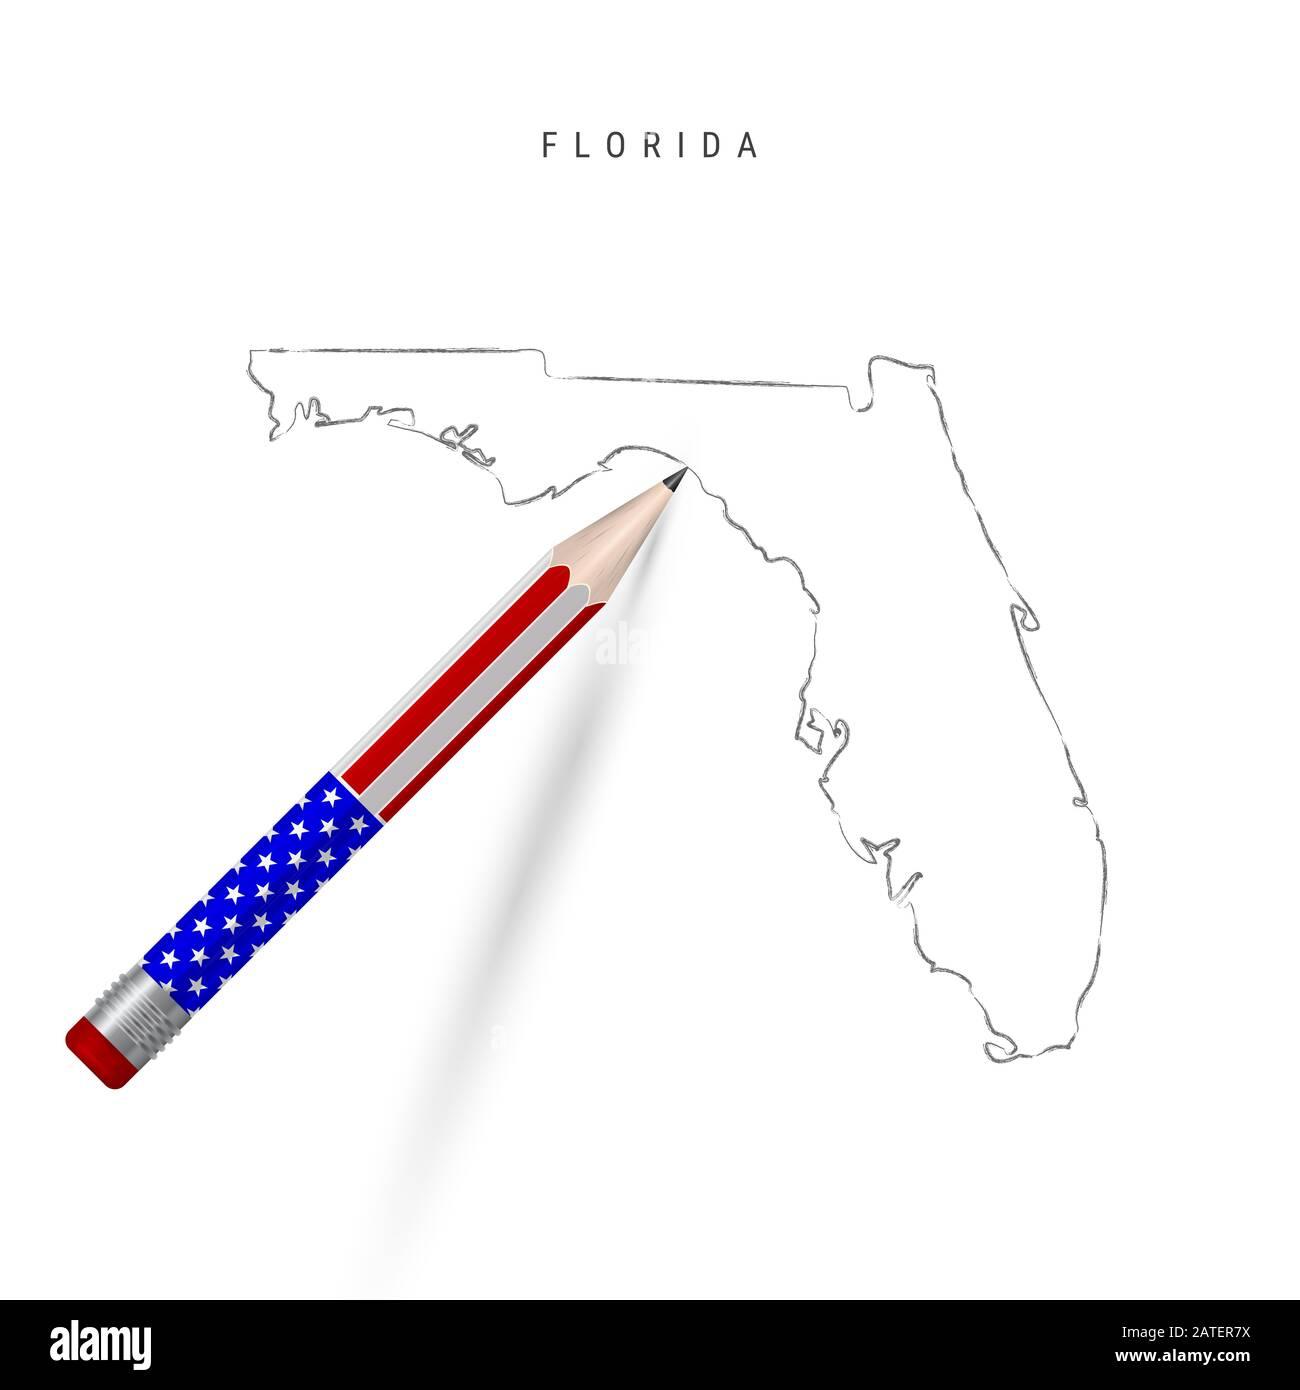 Dibujo De Lápiz De Mapa De Estado De Estados Unidos De Florida Florida Contorno Mapa De